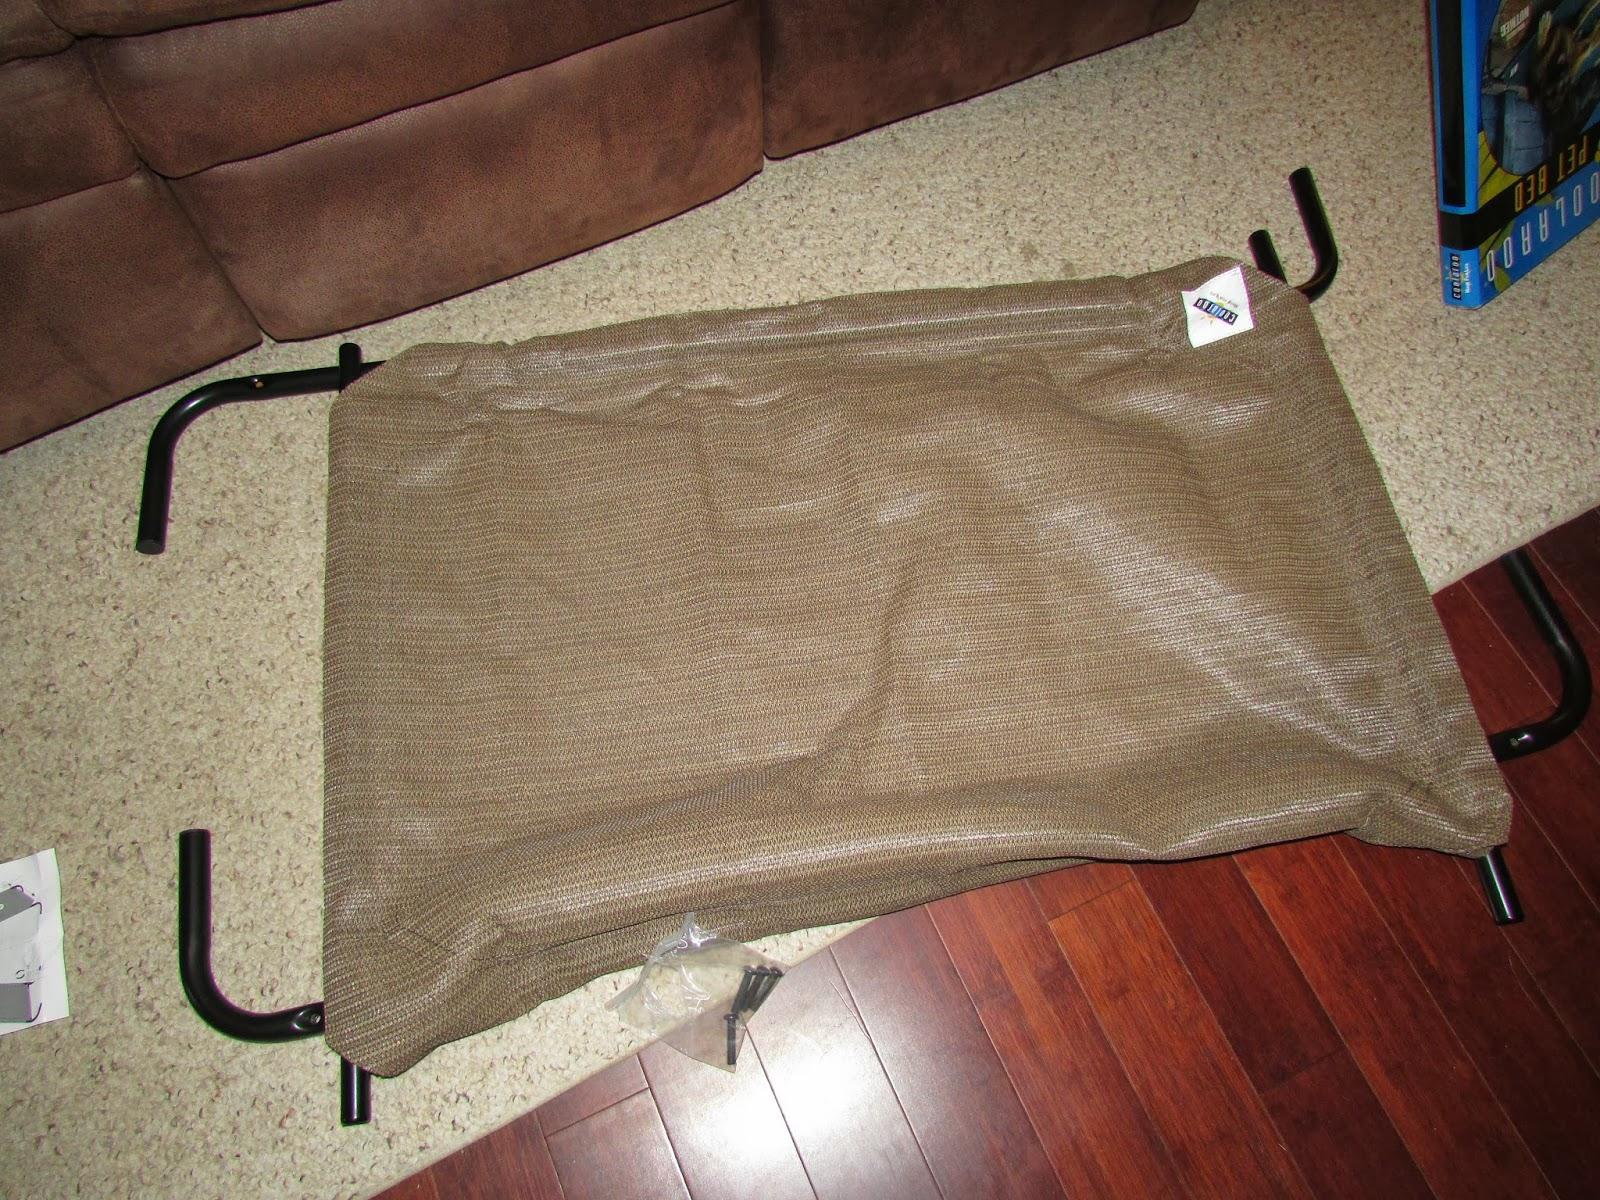 coolaroo kuranda style elevated dog bed review